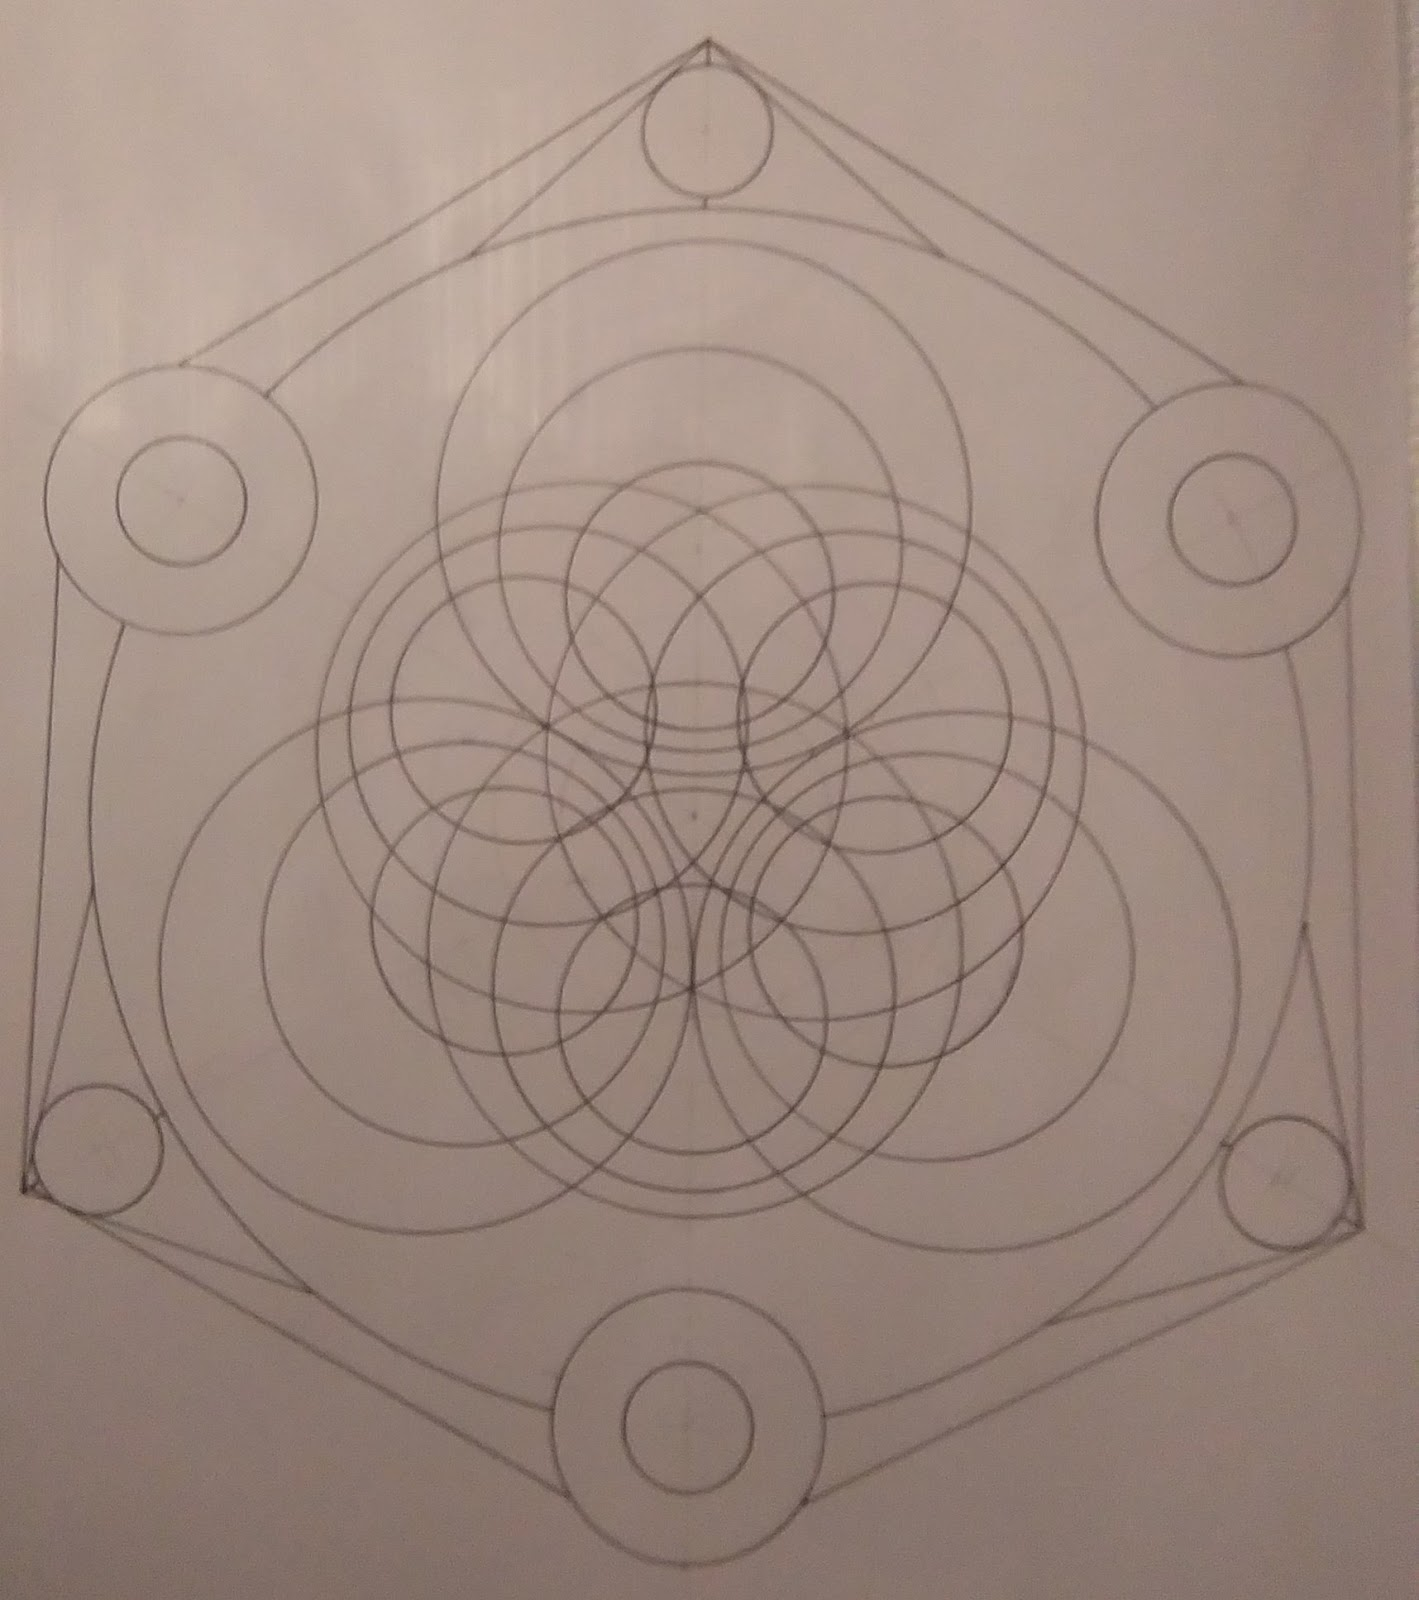 [SPOLYK] - Geometries & sketches - Page 6 48310017_1107573622762654_7854779479623729152_o